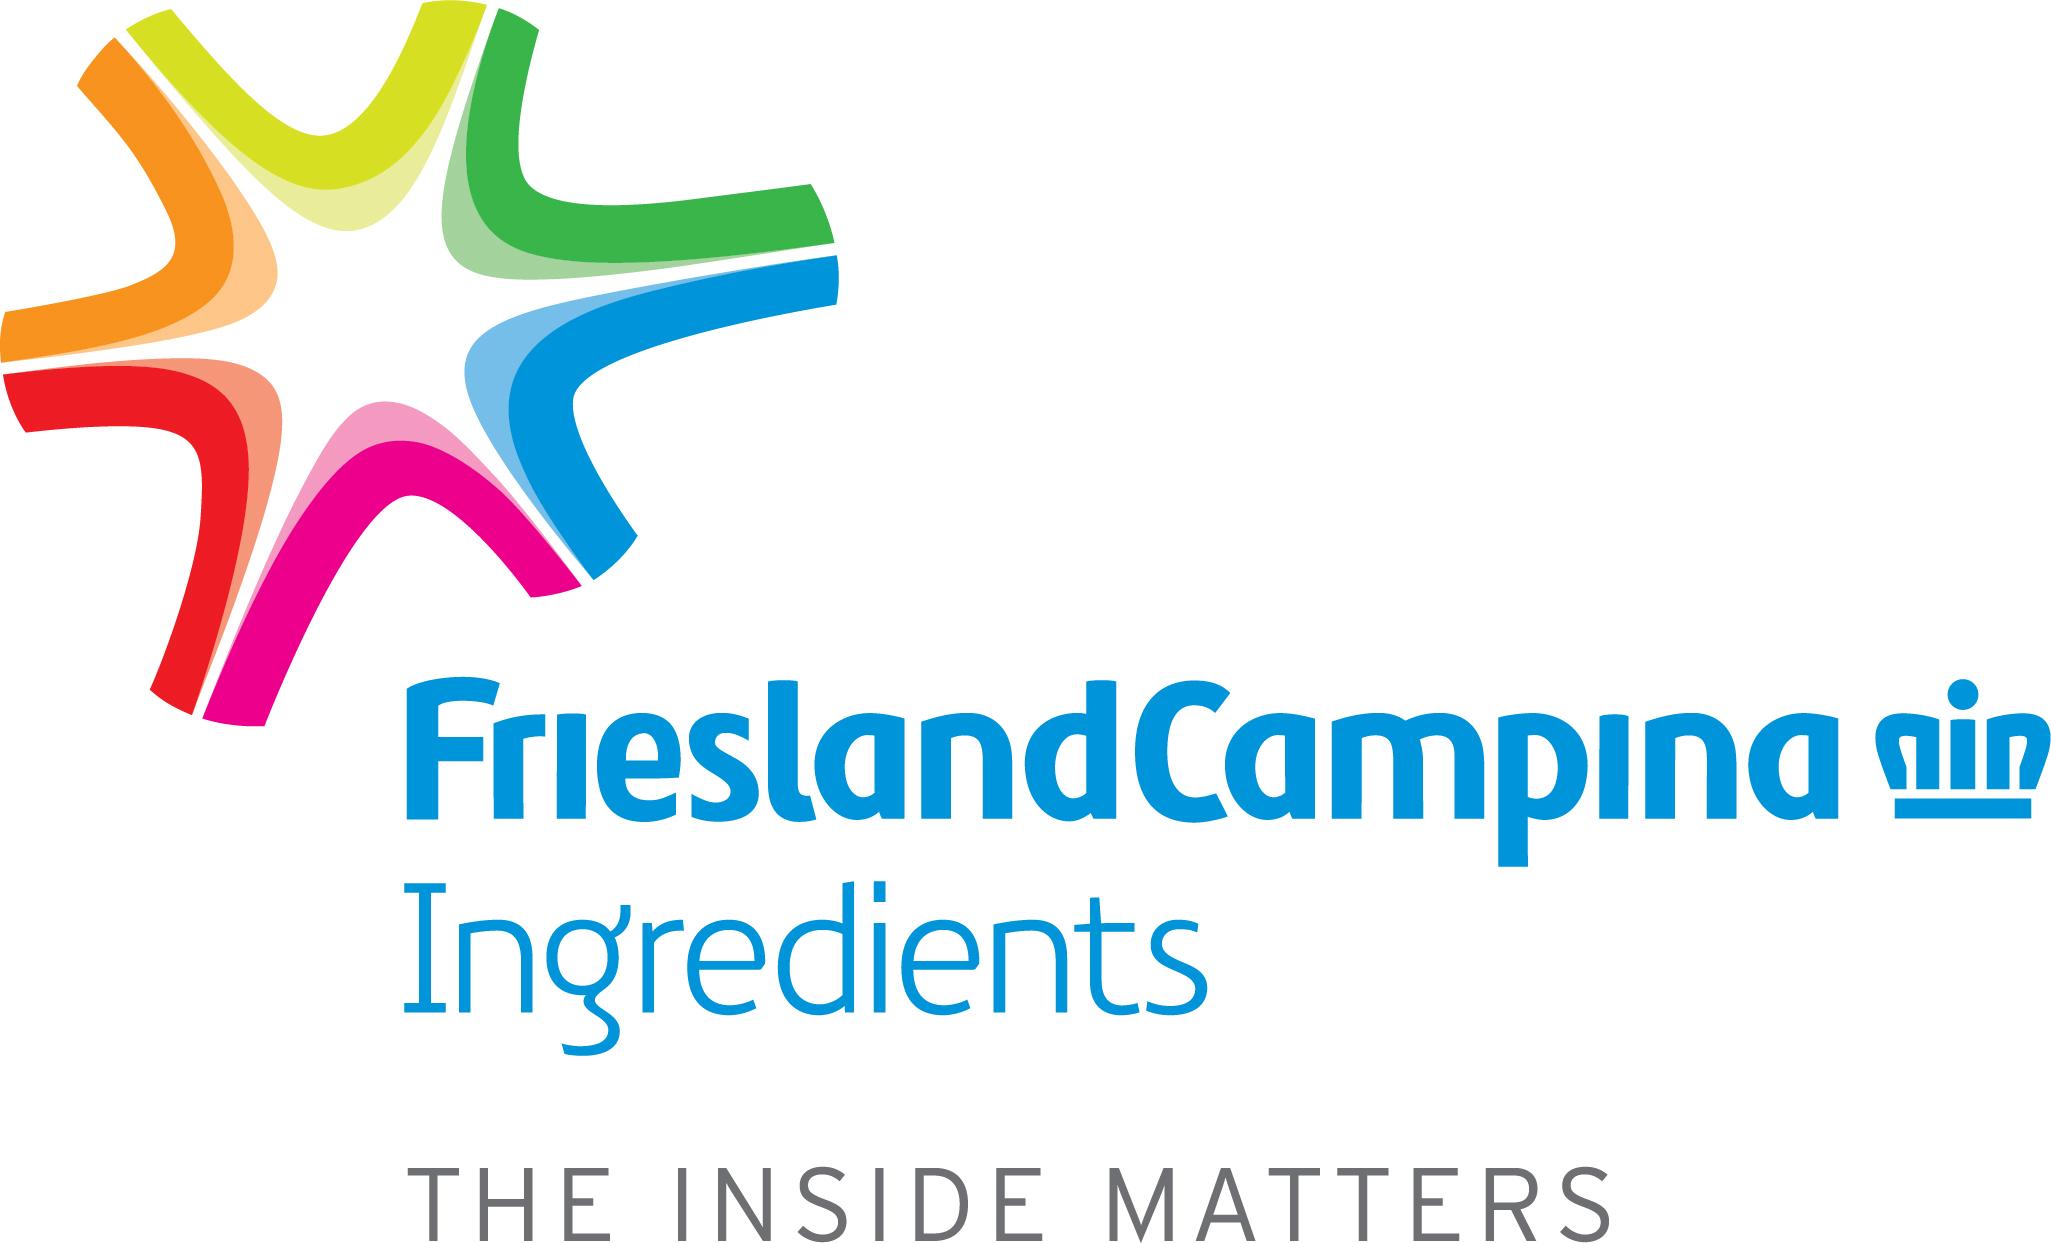 FrieslandCampinaIngredients